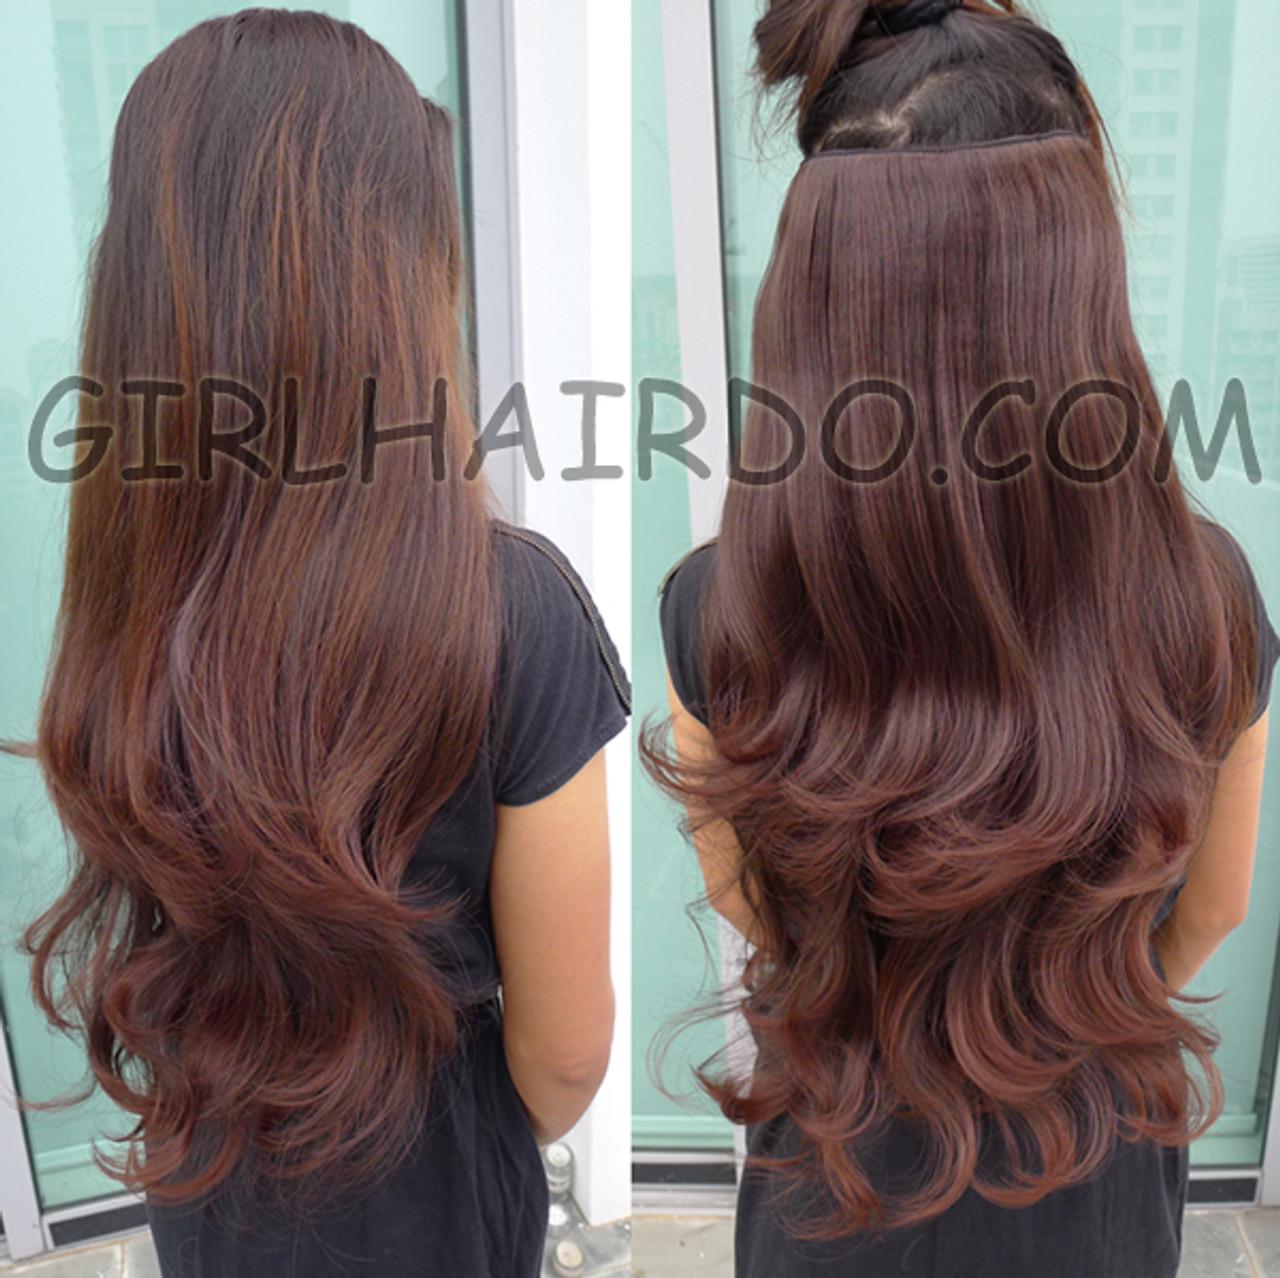 005w new super popular hair extensions black dark brown 005w new super popular hair extensions black dark brown light brown pmusecretfo Choice Image